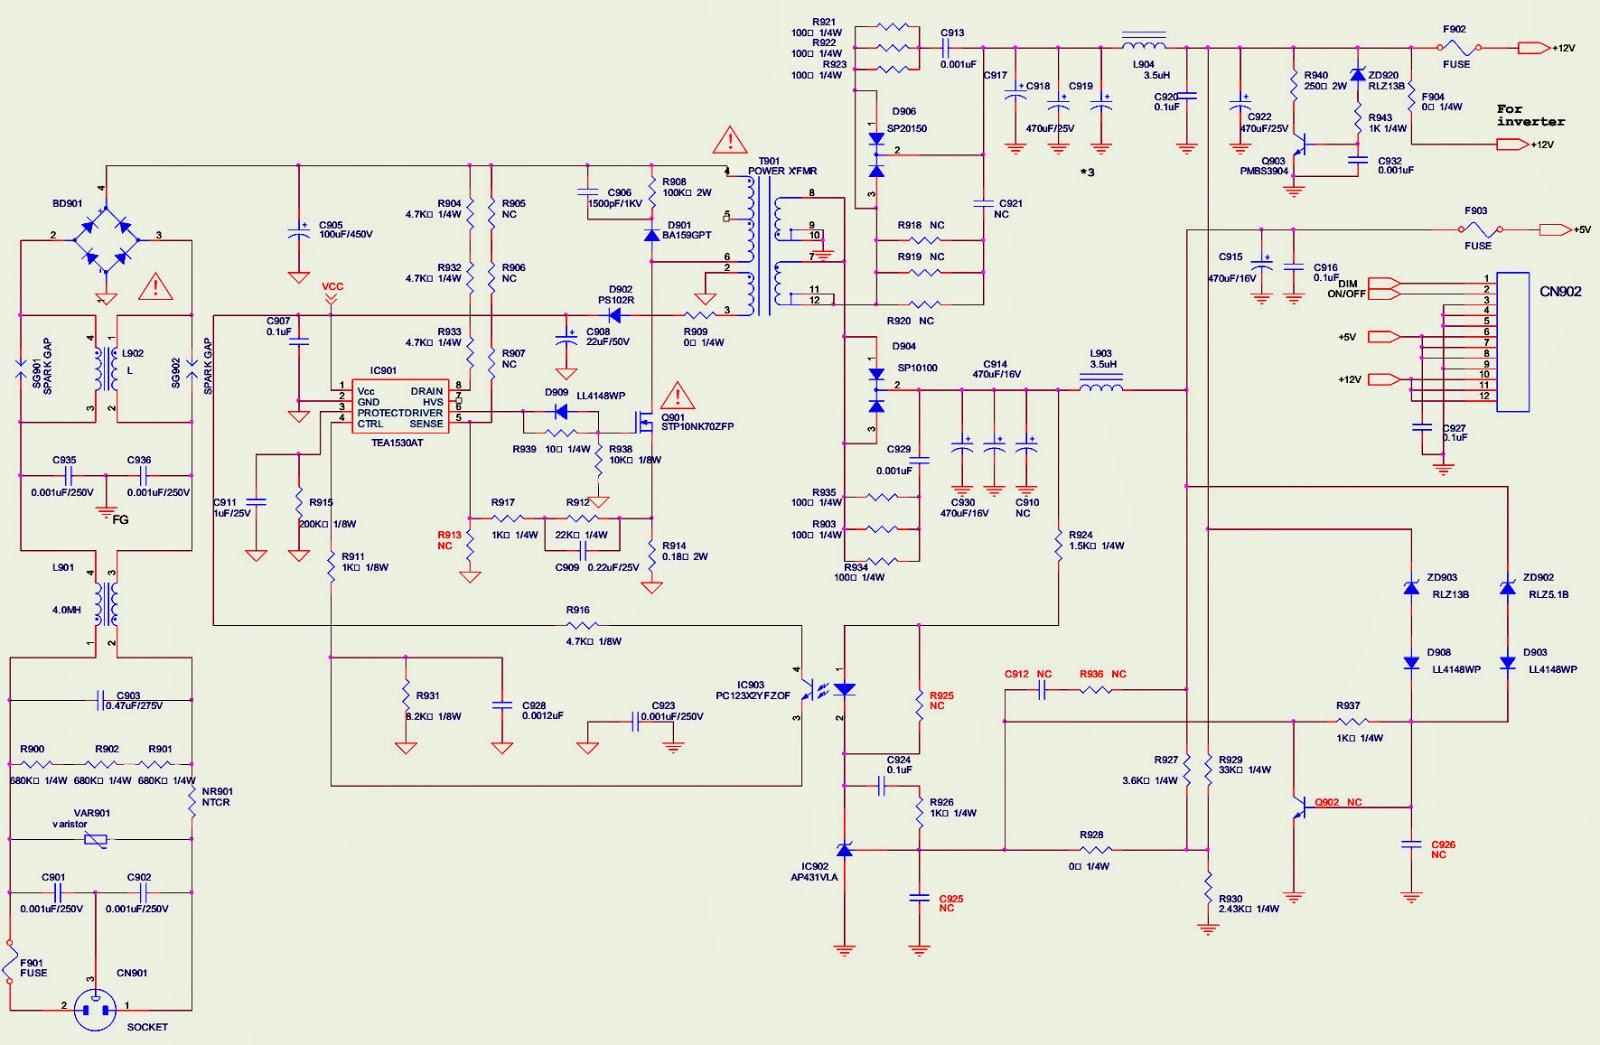 medium resolution of aoc 212va monitor power supply schematic circuit diagram troubleshooting